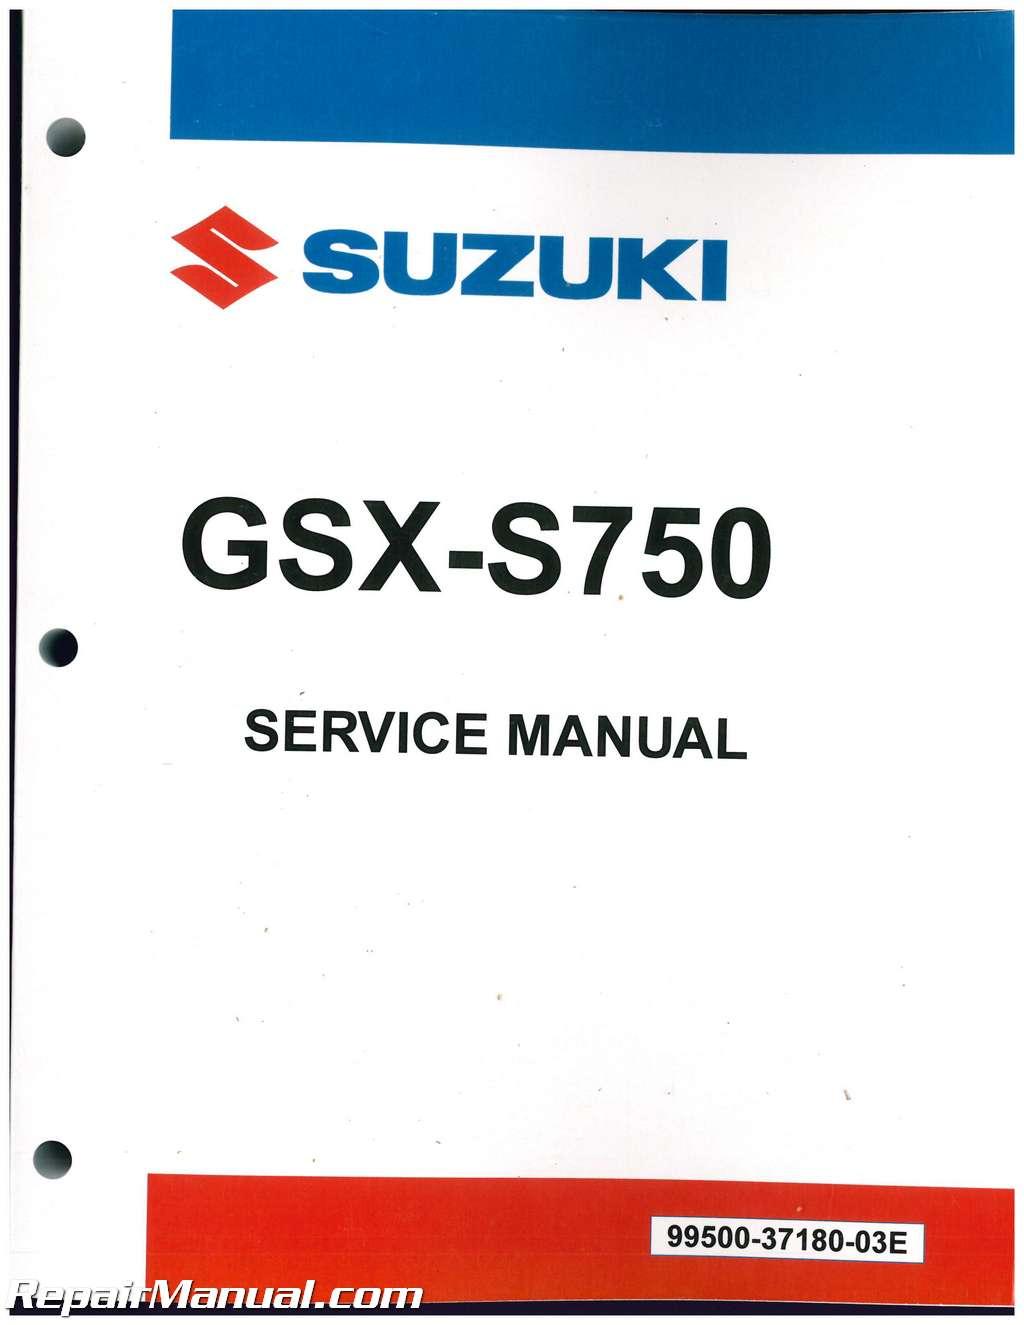 2018 suzuki gsx s750 motorcycle repair manual. Black Bedroom Furniture Sets. Home Design Ideas